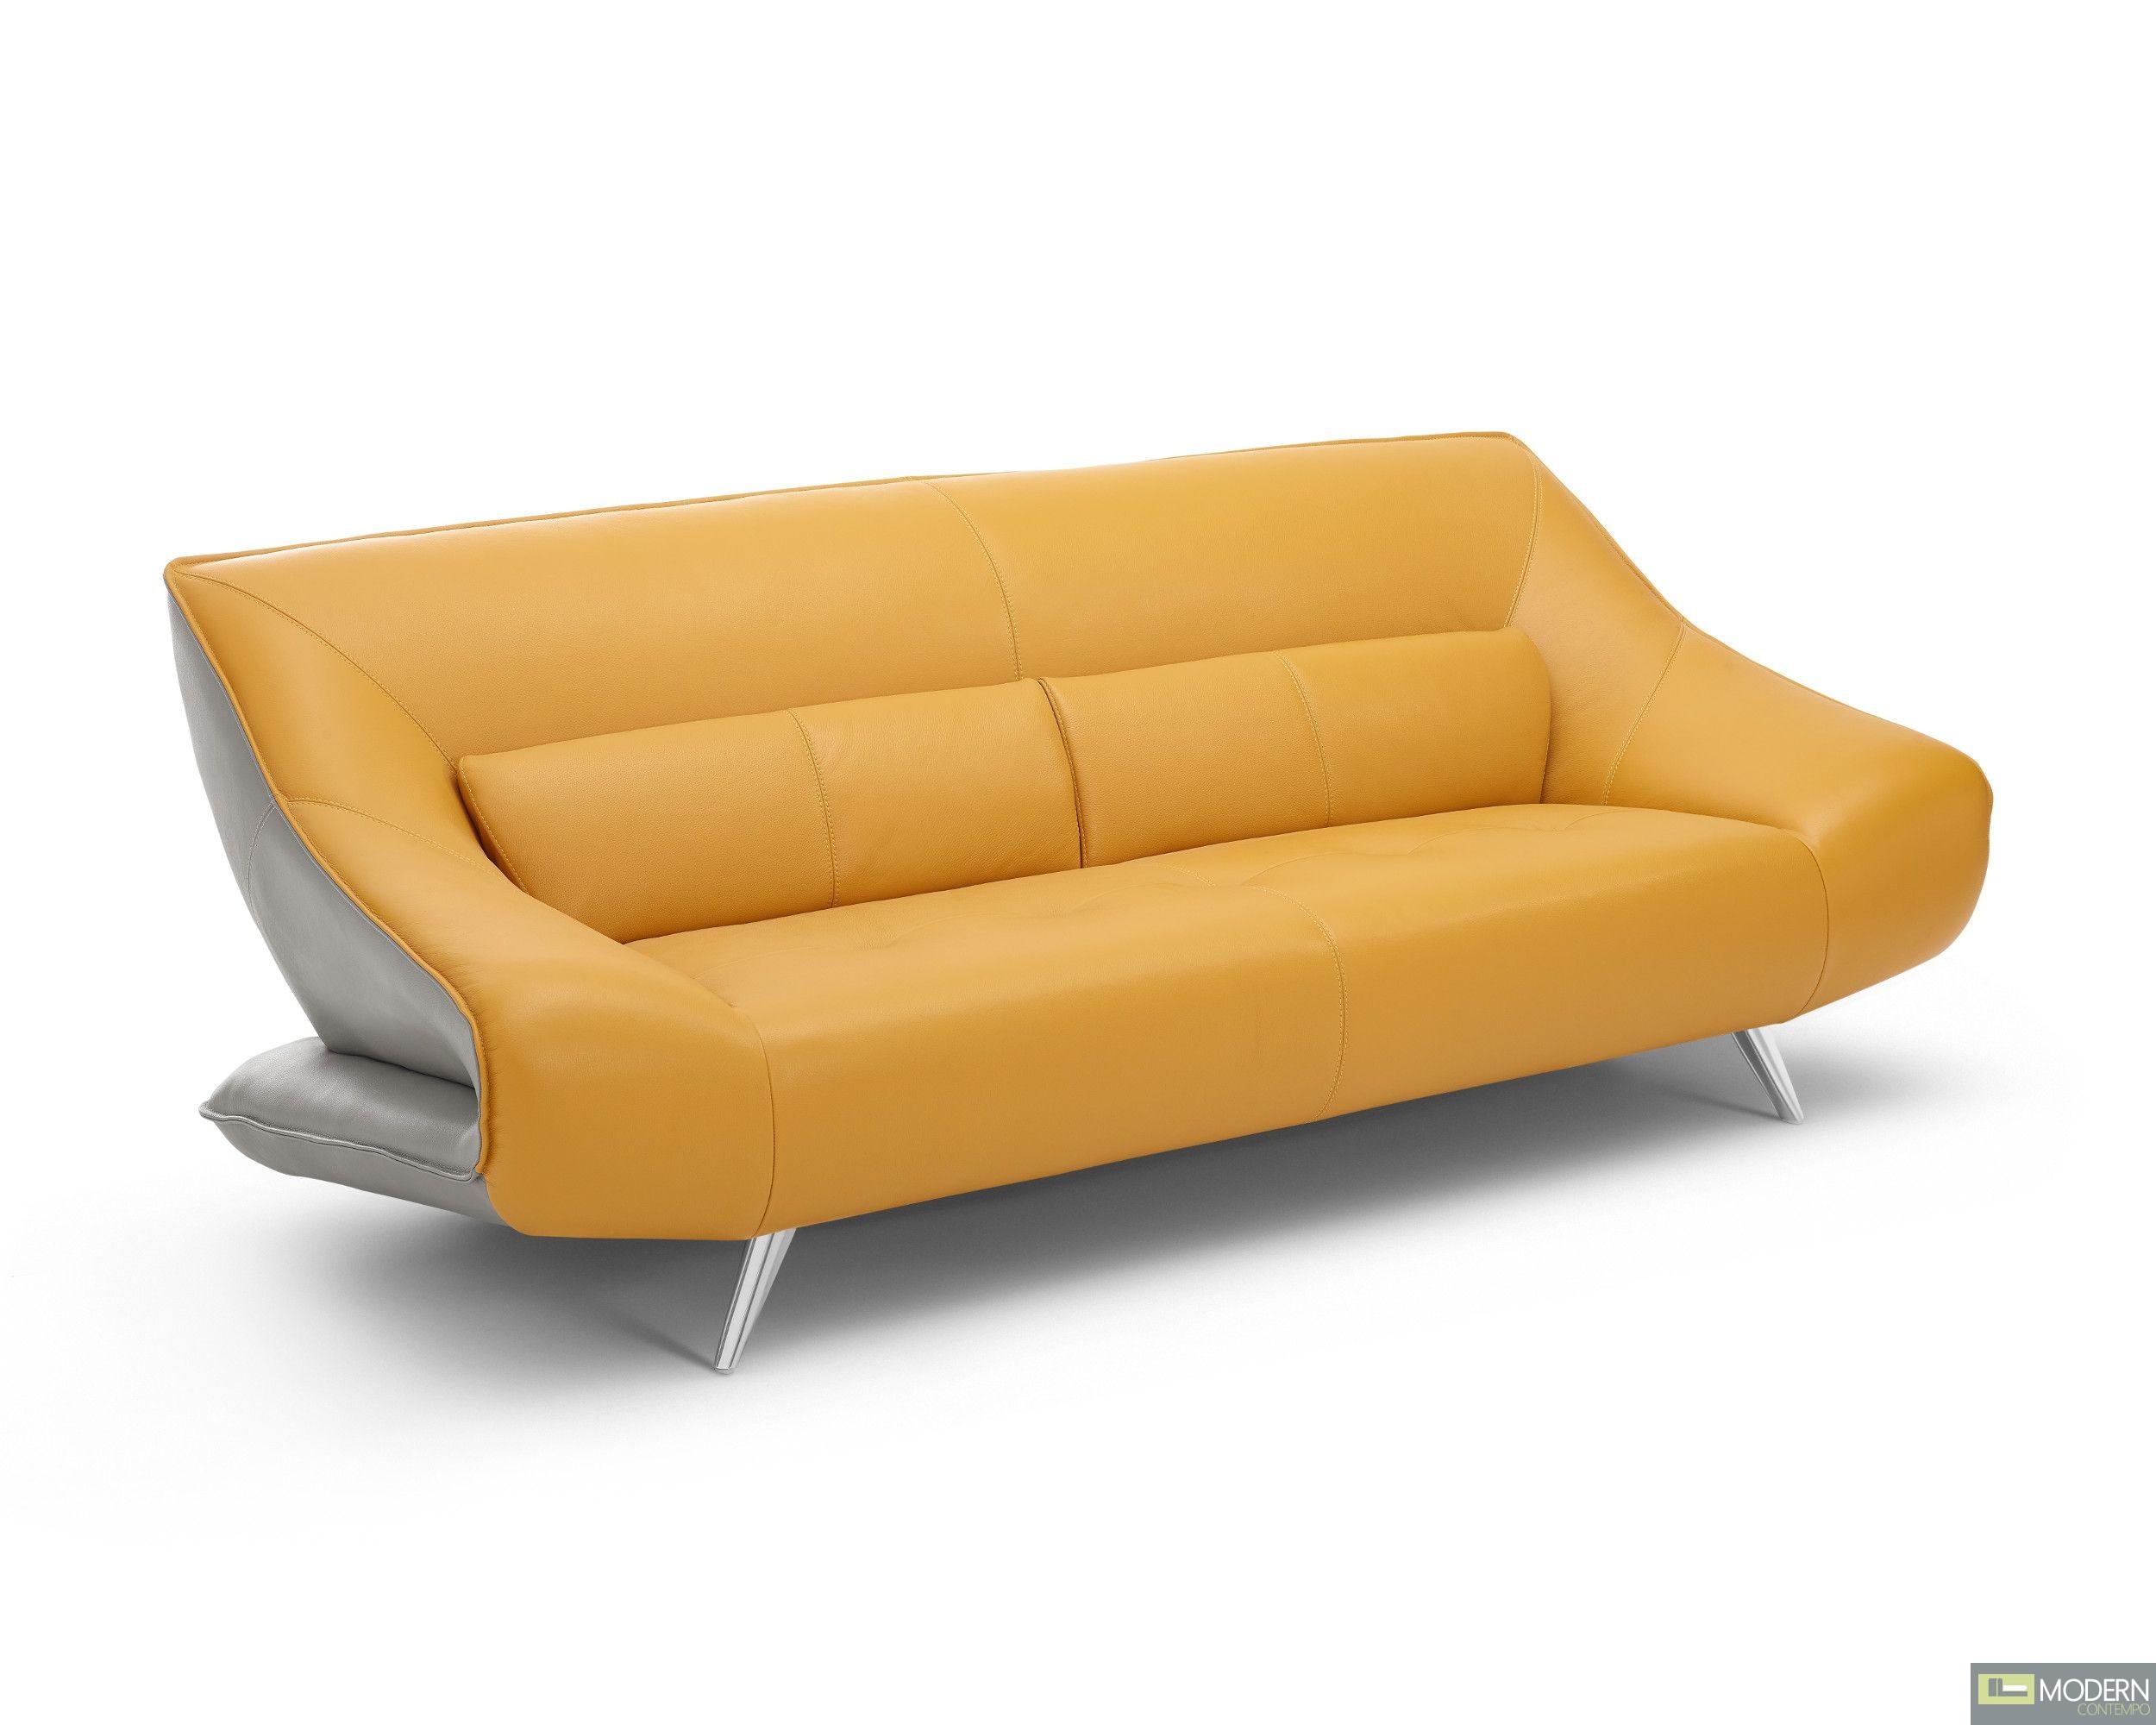 Barcelona Italian Leather Sofa